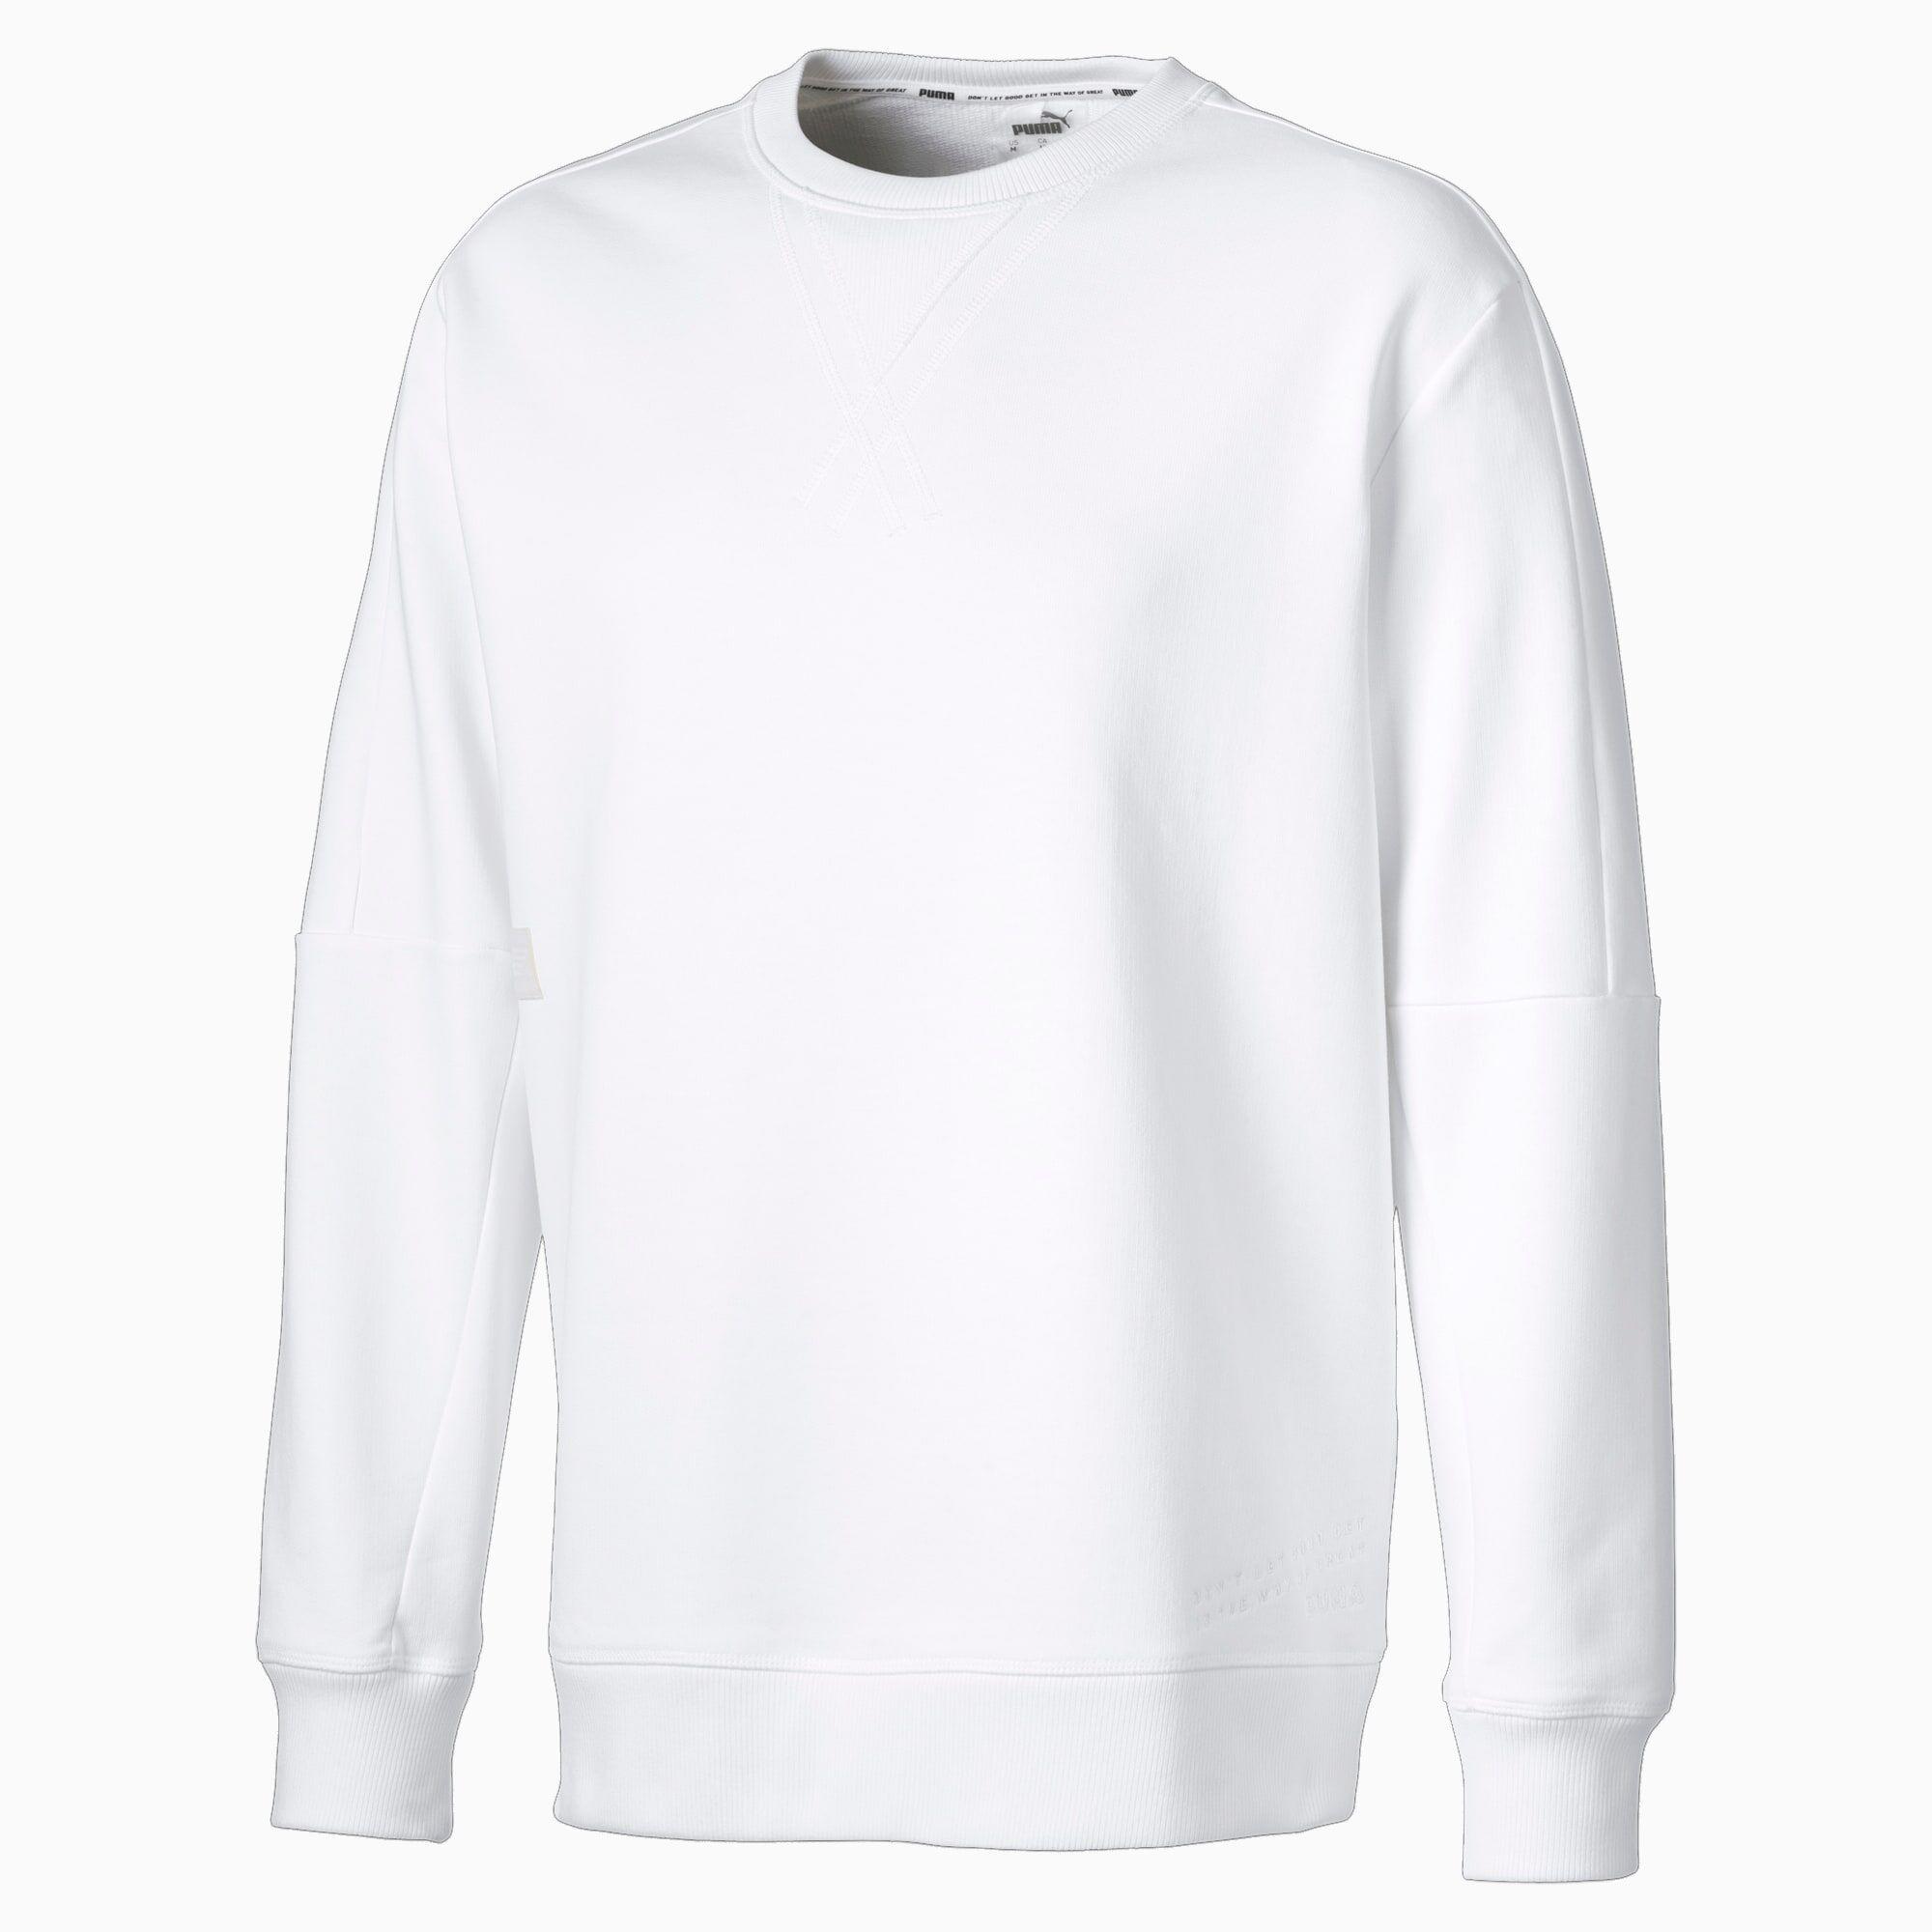 PUMA Sweat Jump Hook Basketball pour Homme, Blanc, Taille 4XL, Vêtements